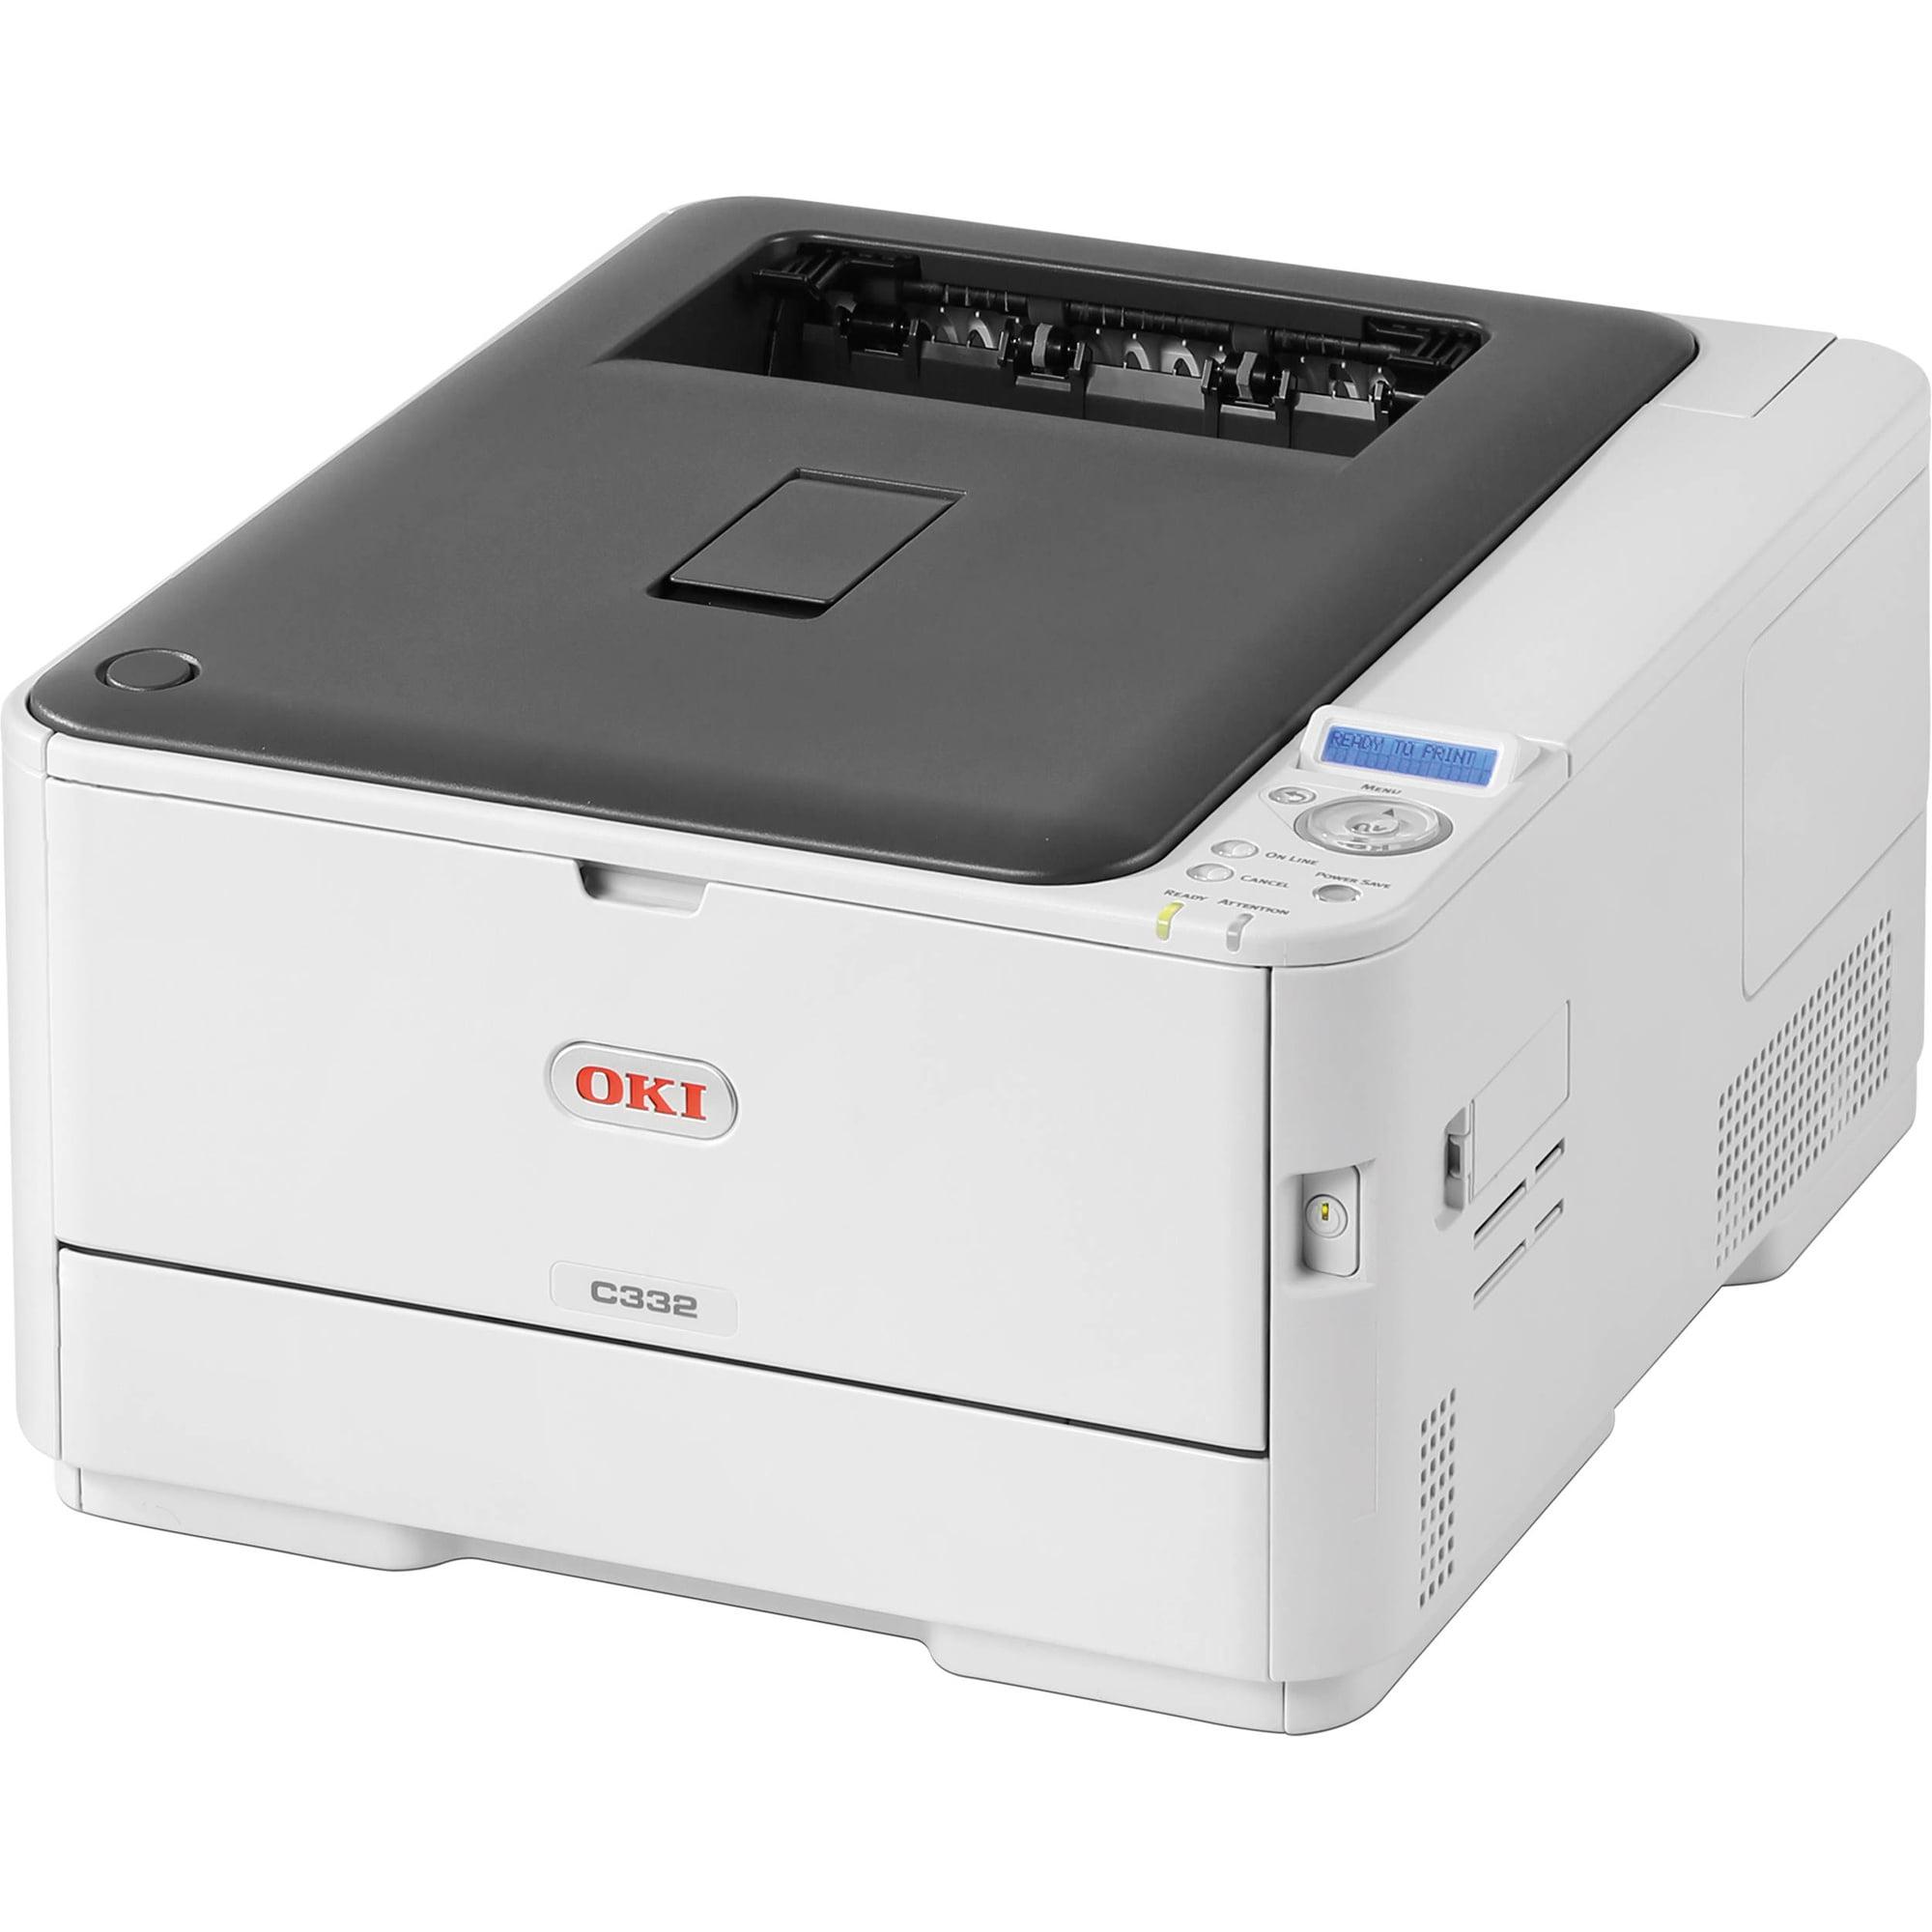 Okidata 62447501 C332dn Digital Color Printer